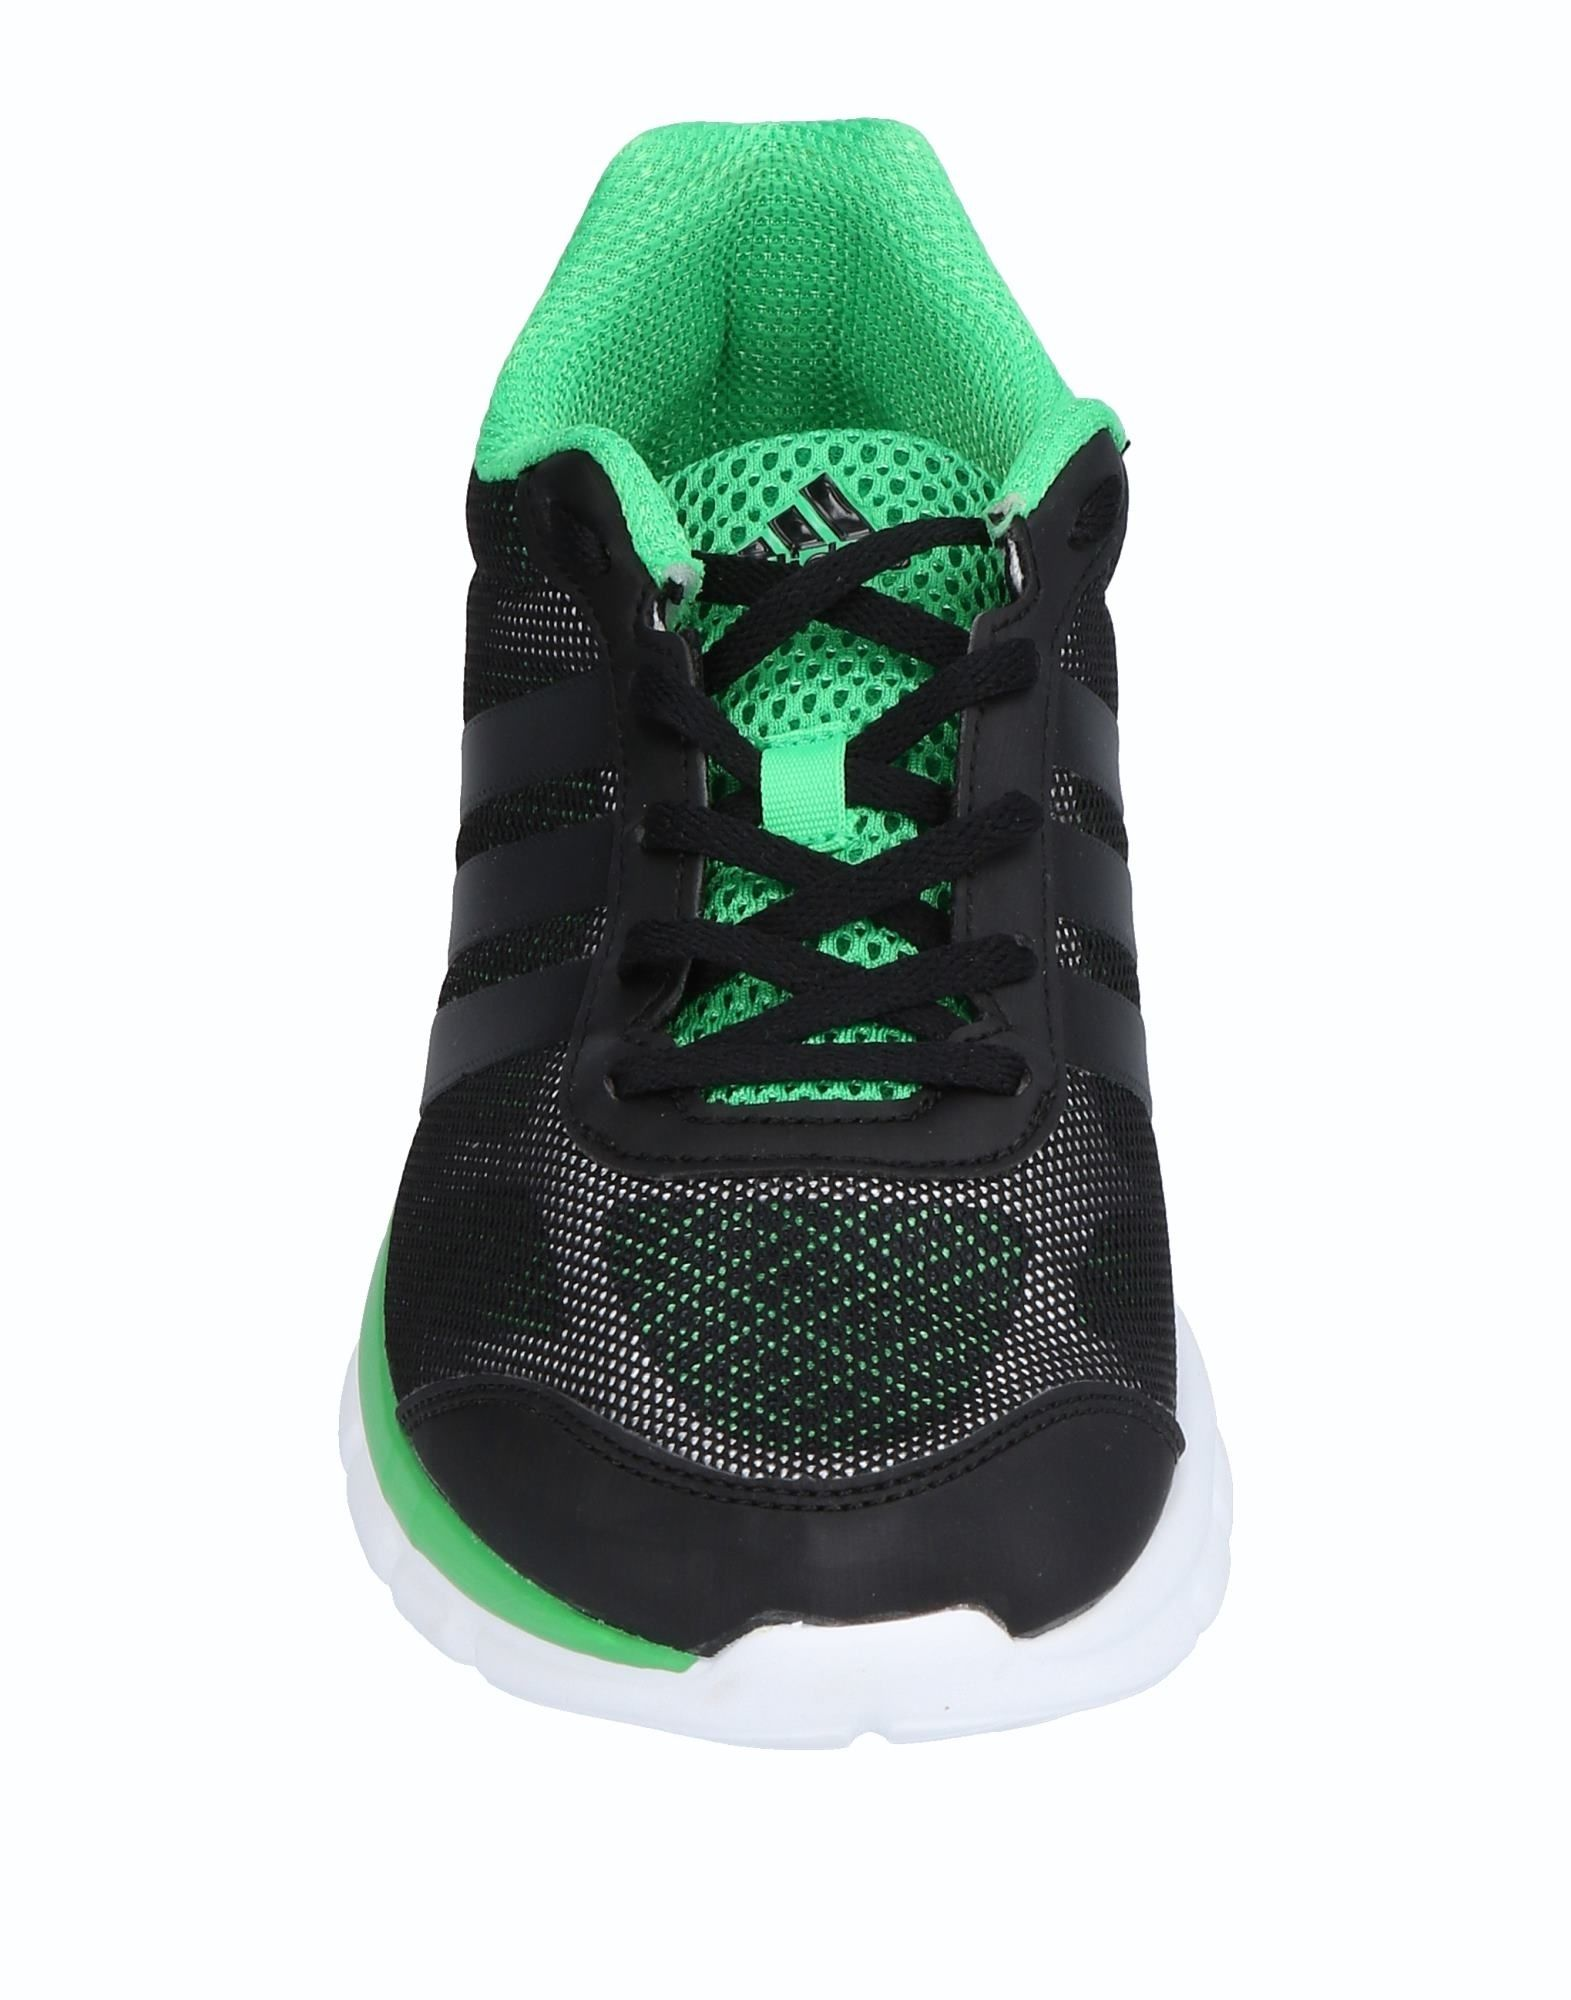 Adidas Sneakers Sneakers Sneakers - Men Adidas Sneakers online on  United Kingdom - 11503541VX 7b27be